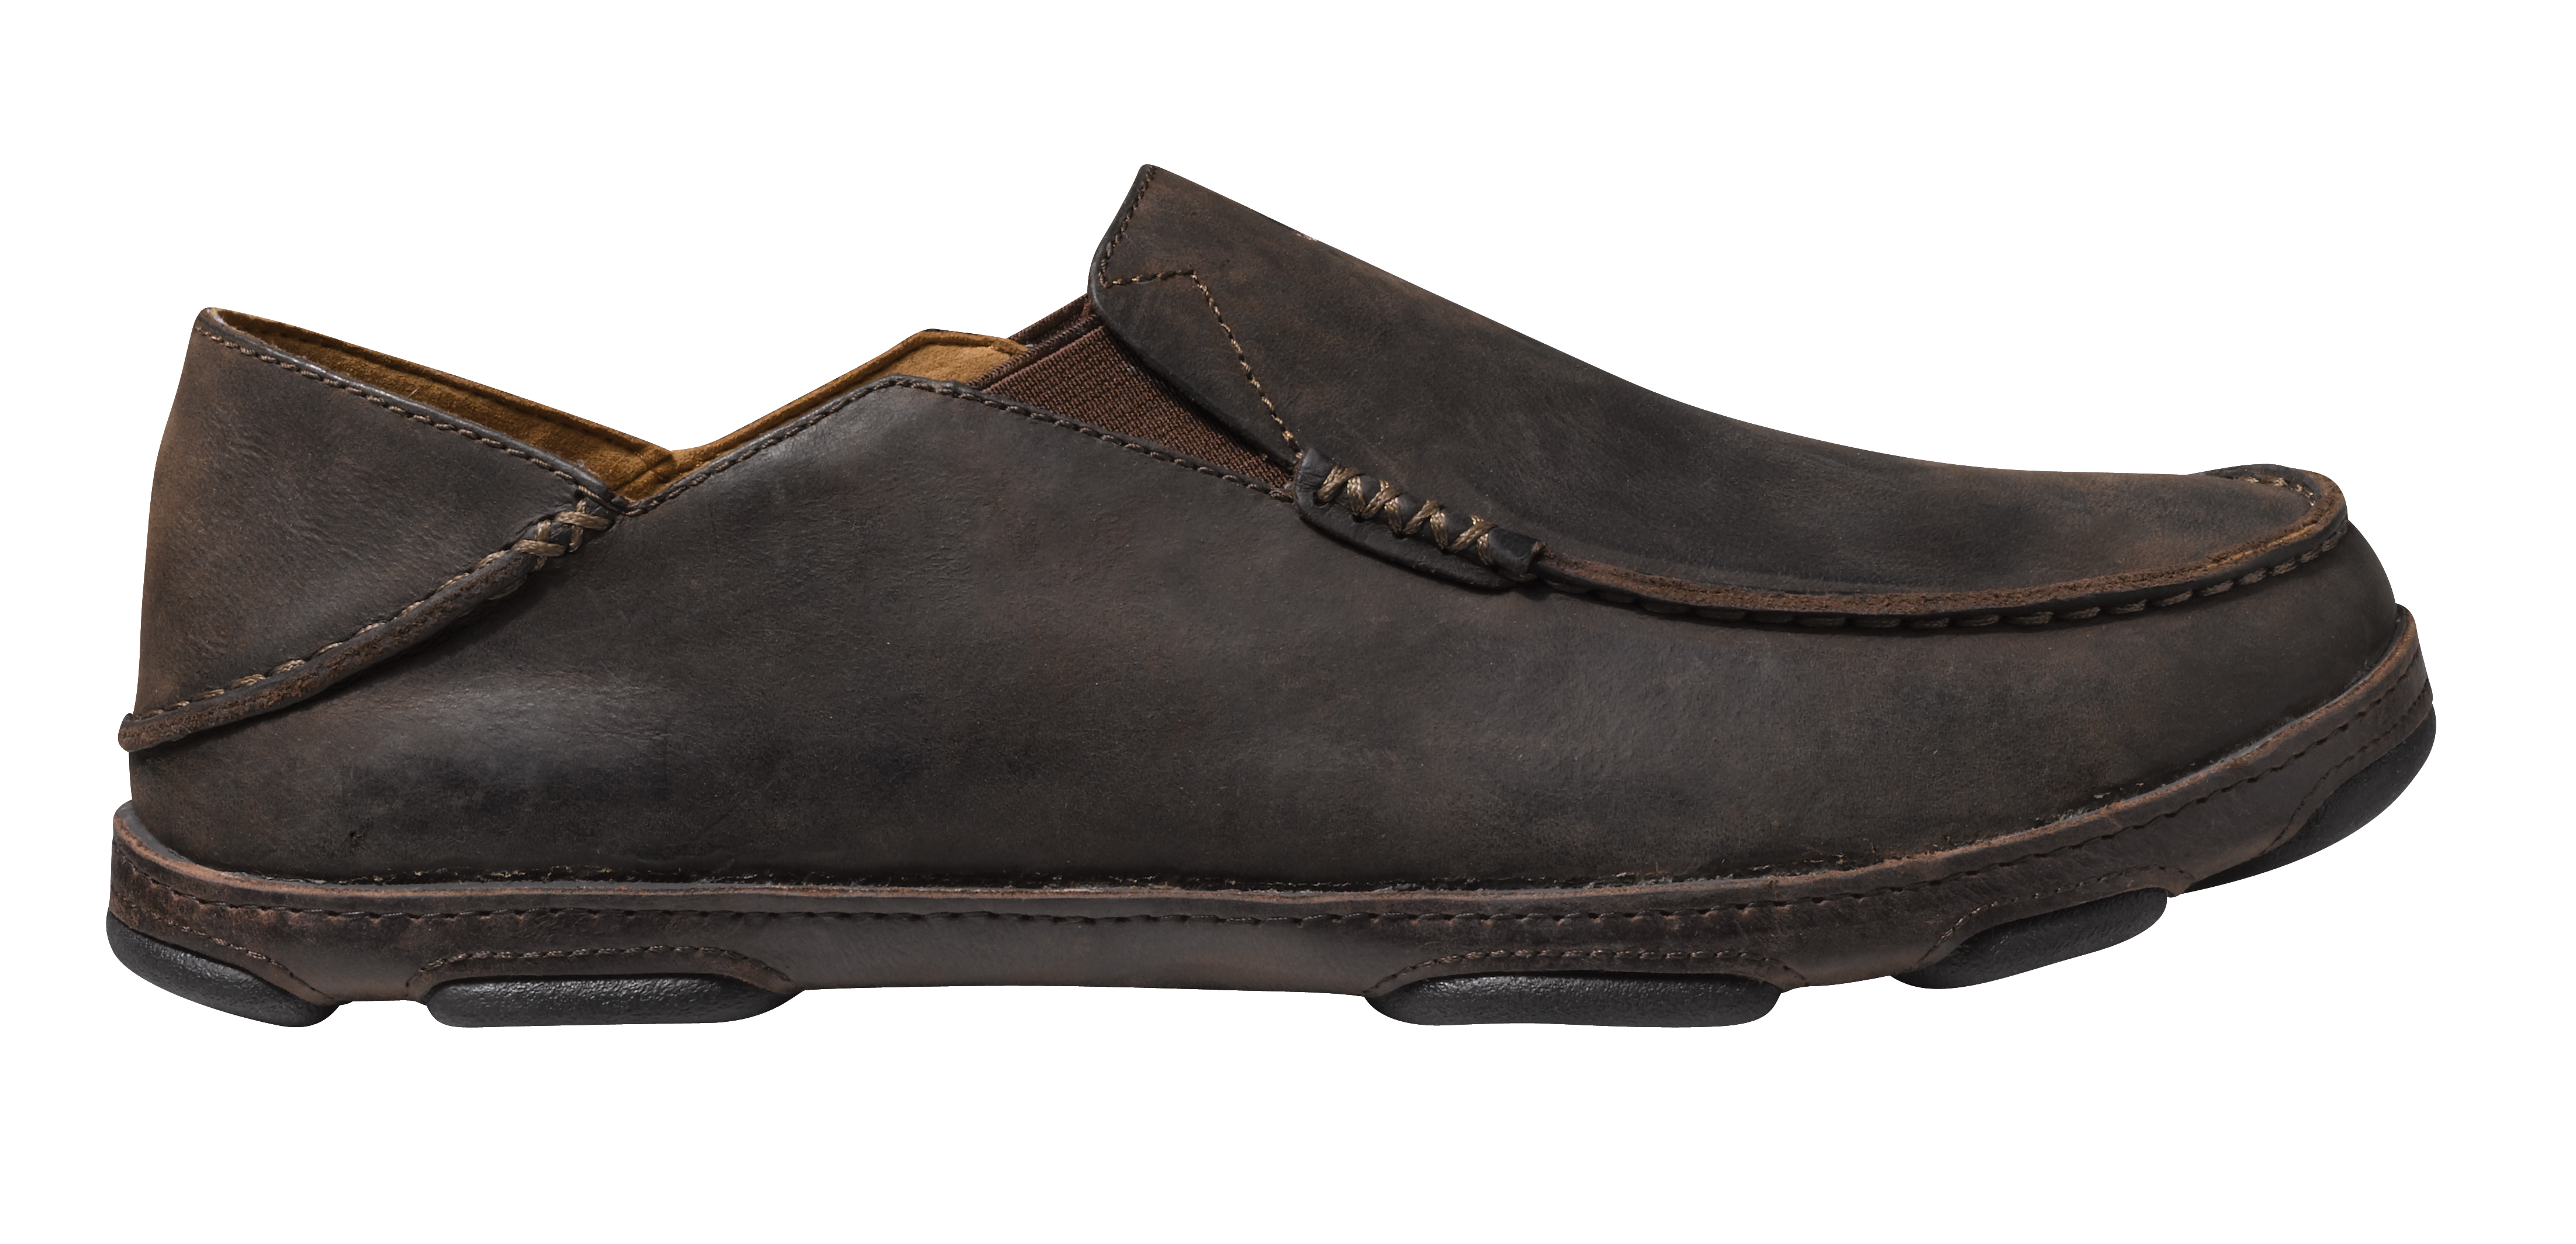 Olukai Moloa Shoes Mens D Island Moccasine Slip On Lacoste Suede Blue